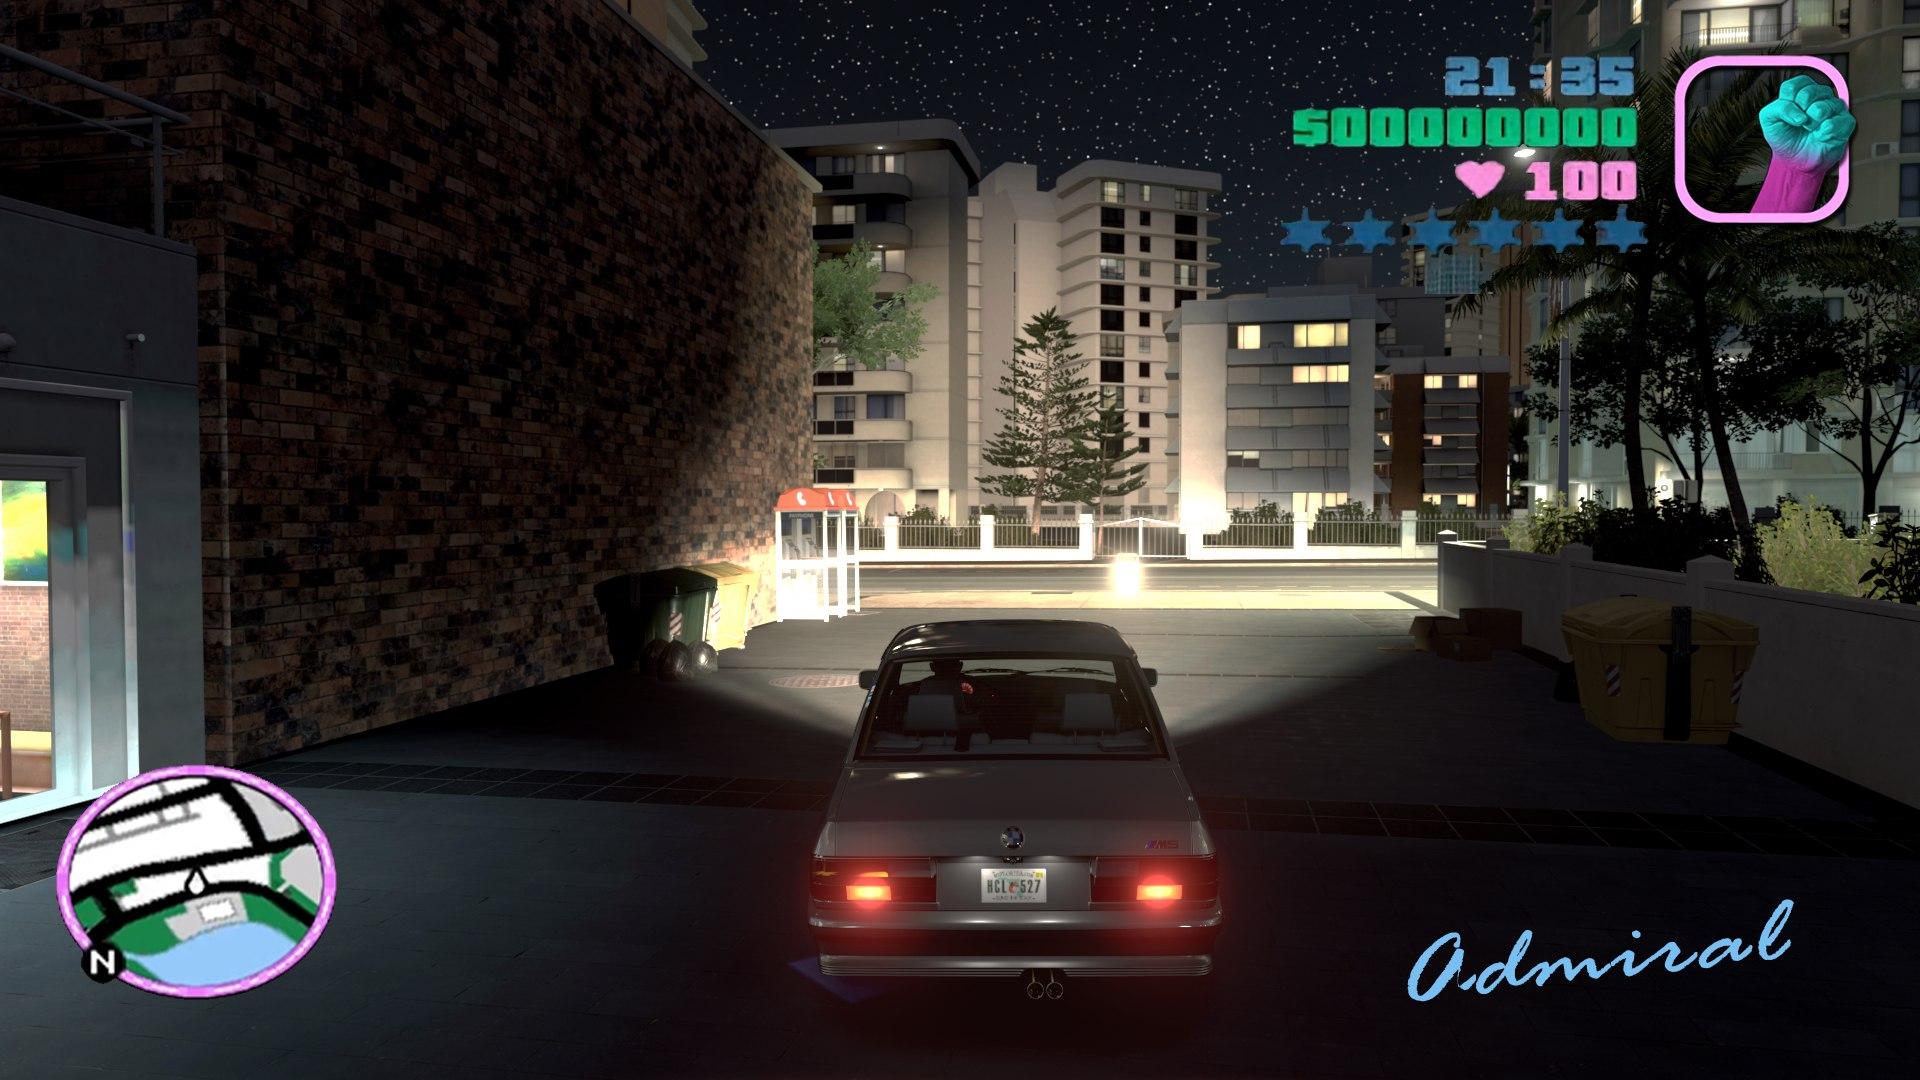 fe93ad5458fd9d3c09cbb7775202d938.jpg - Grand Theft Auto: Vice City